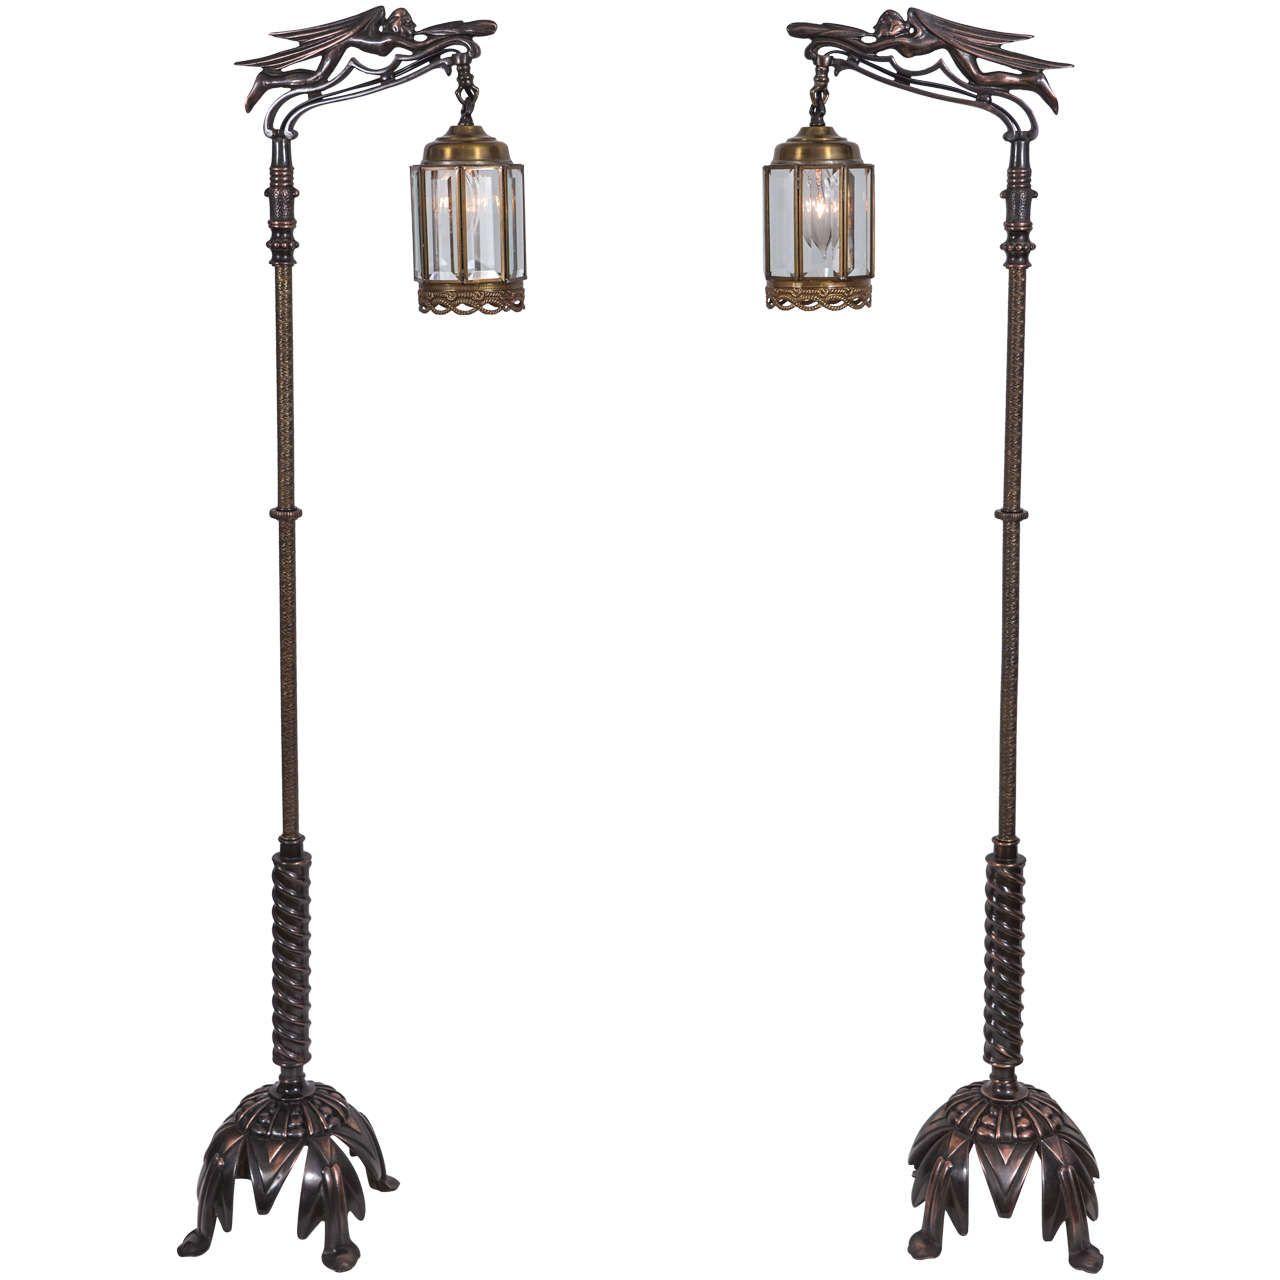 Pair of Vintage Rembrandt Bridge Lamps   Rembrandt, Floor lamp and ...